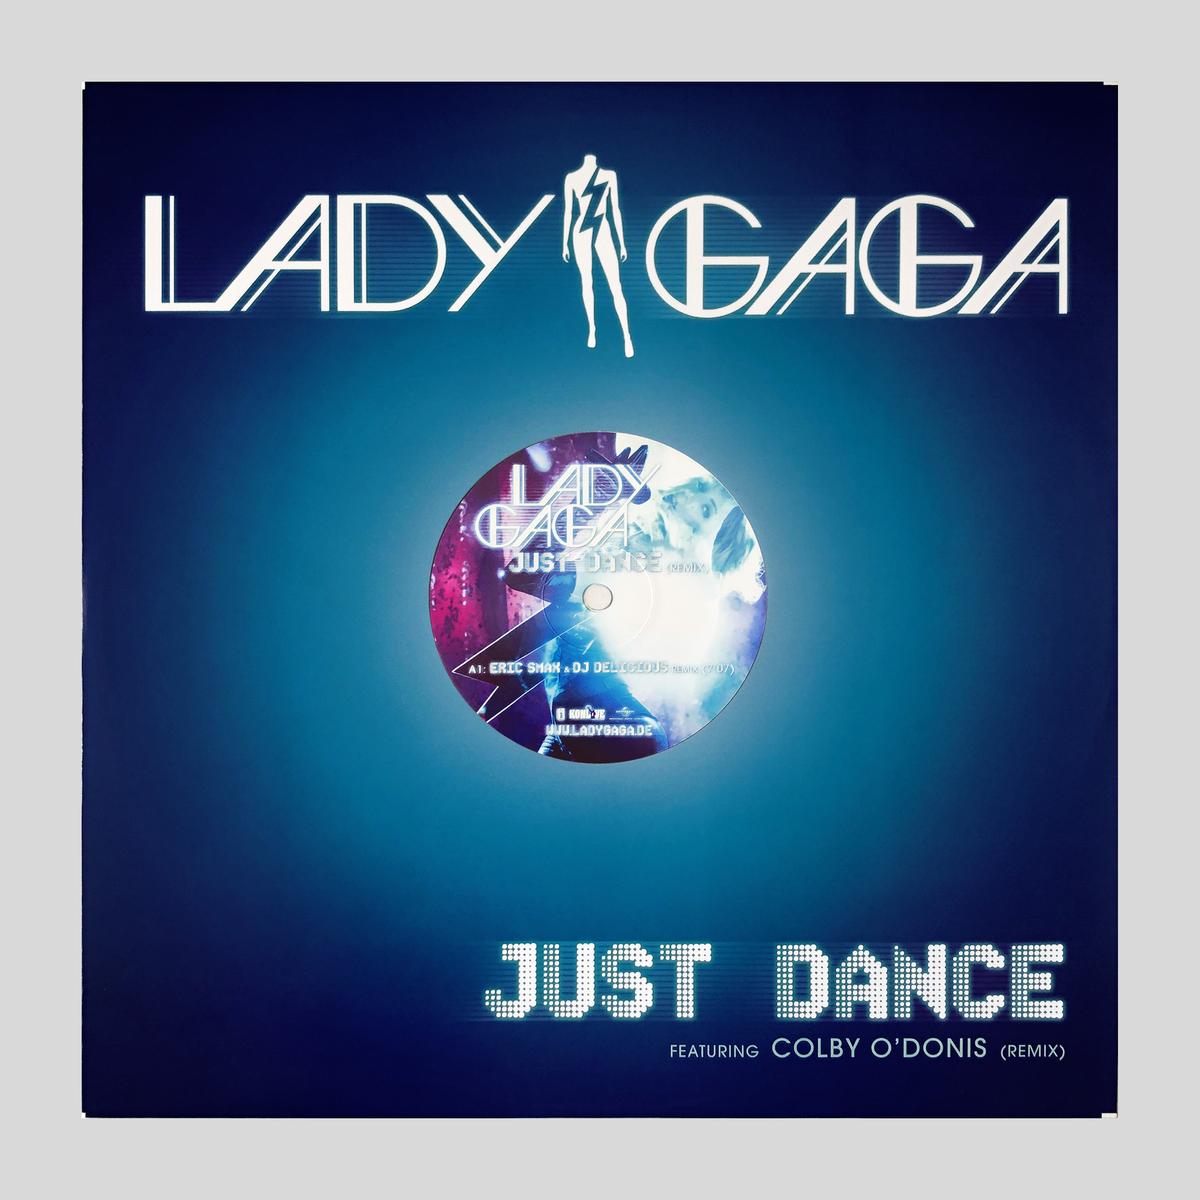 Just Dance (Remix) [Promo] (Vinyl) 1.jpg